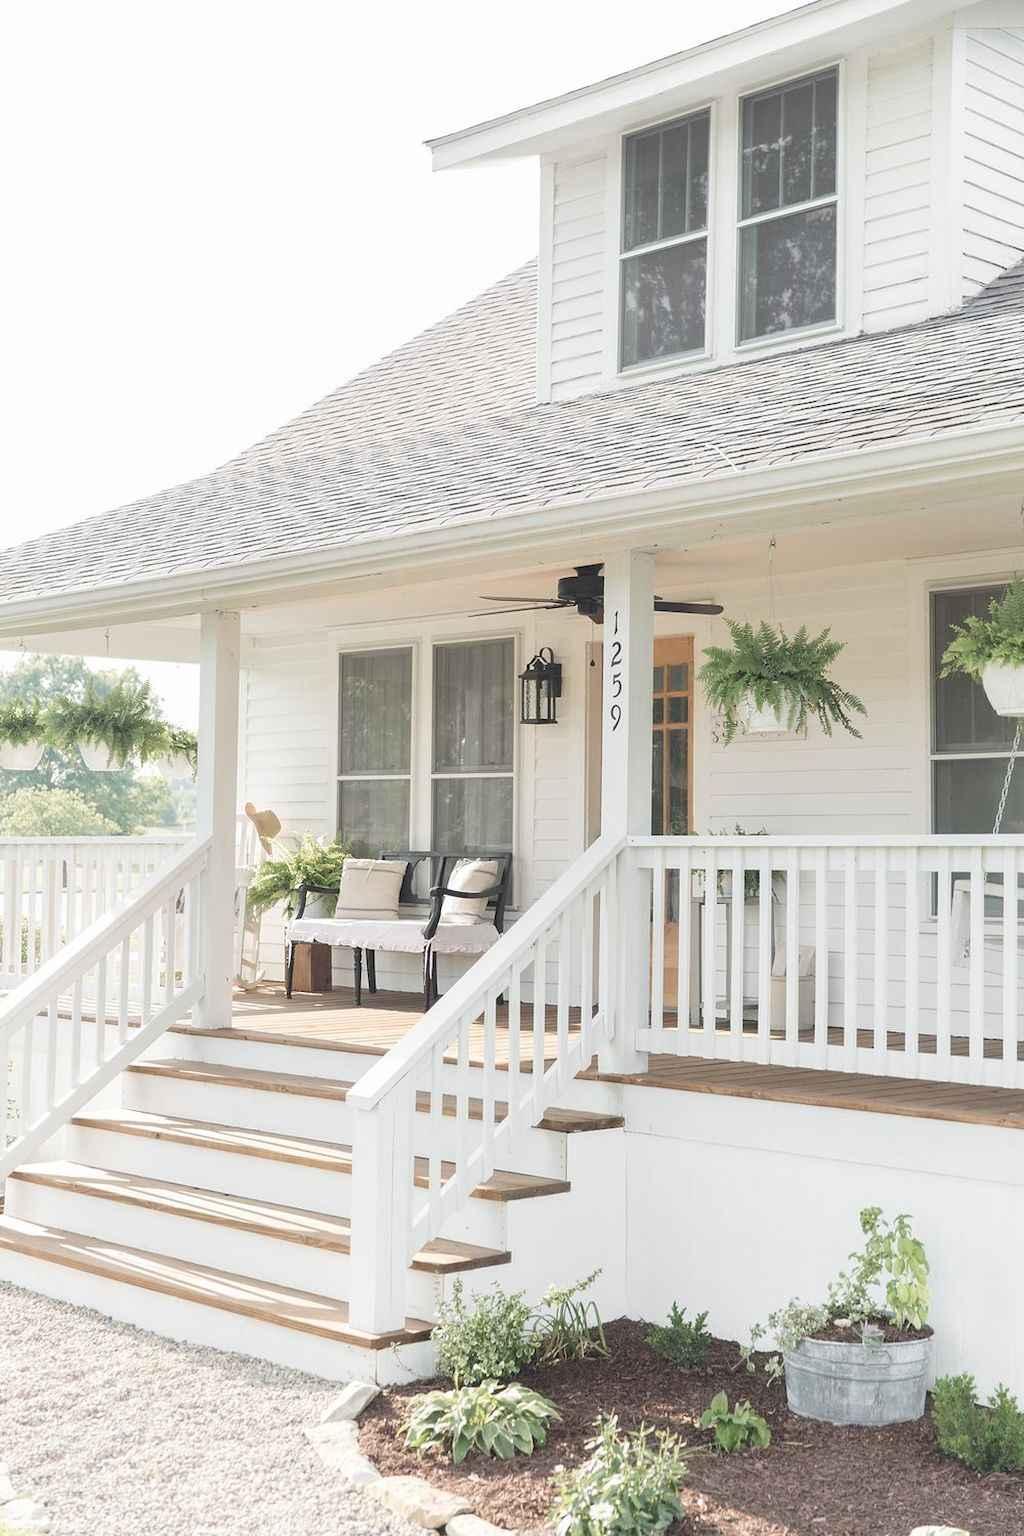 Vintage farmhouse porch ideas (52)